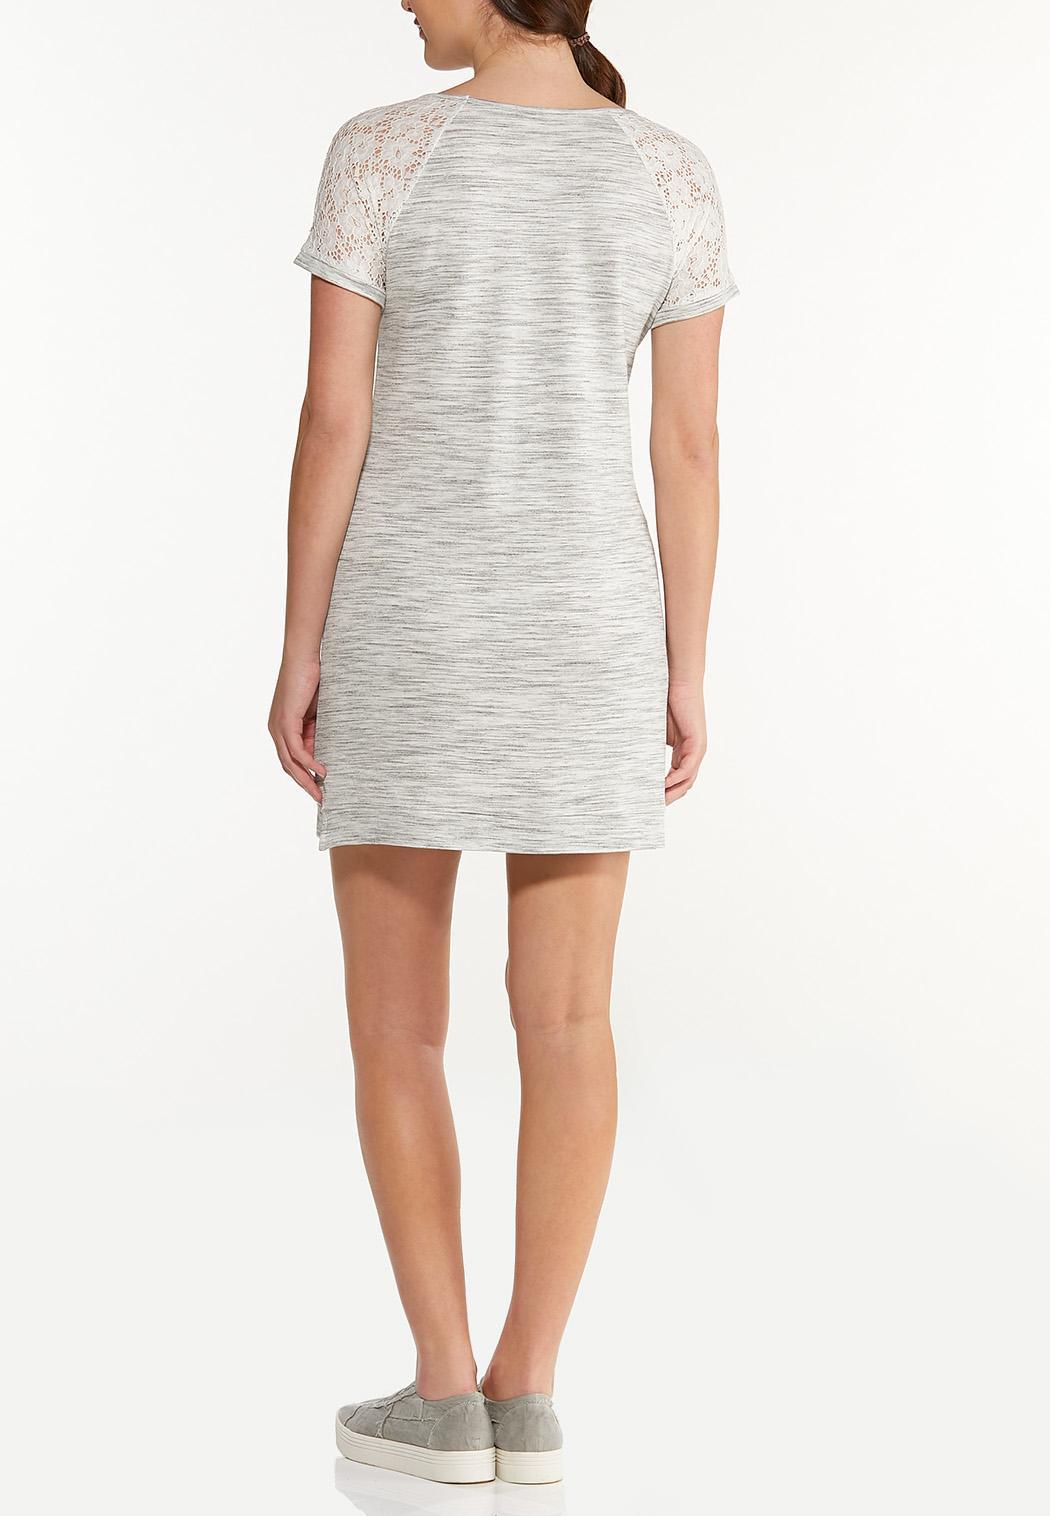 Casual Lace Trim Dress (Item #44548444)